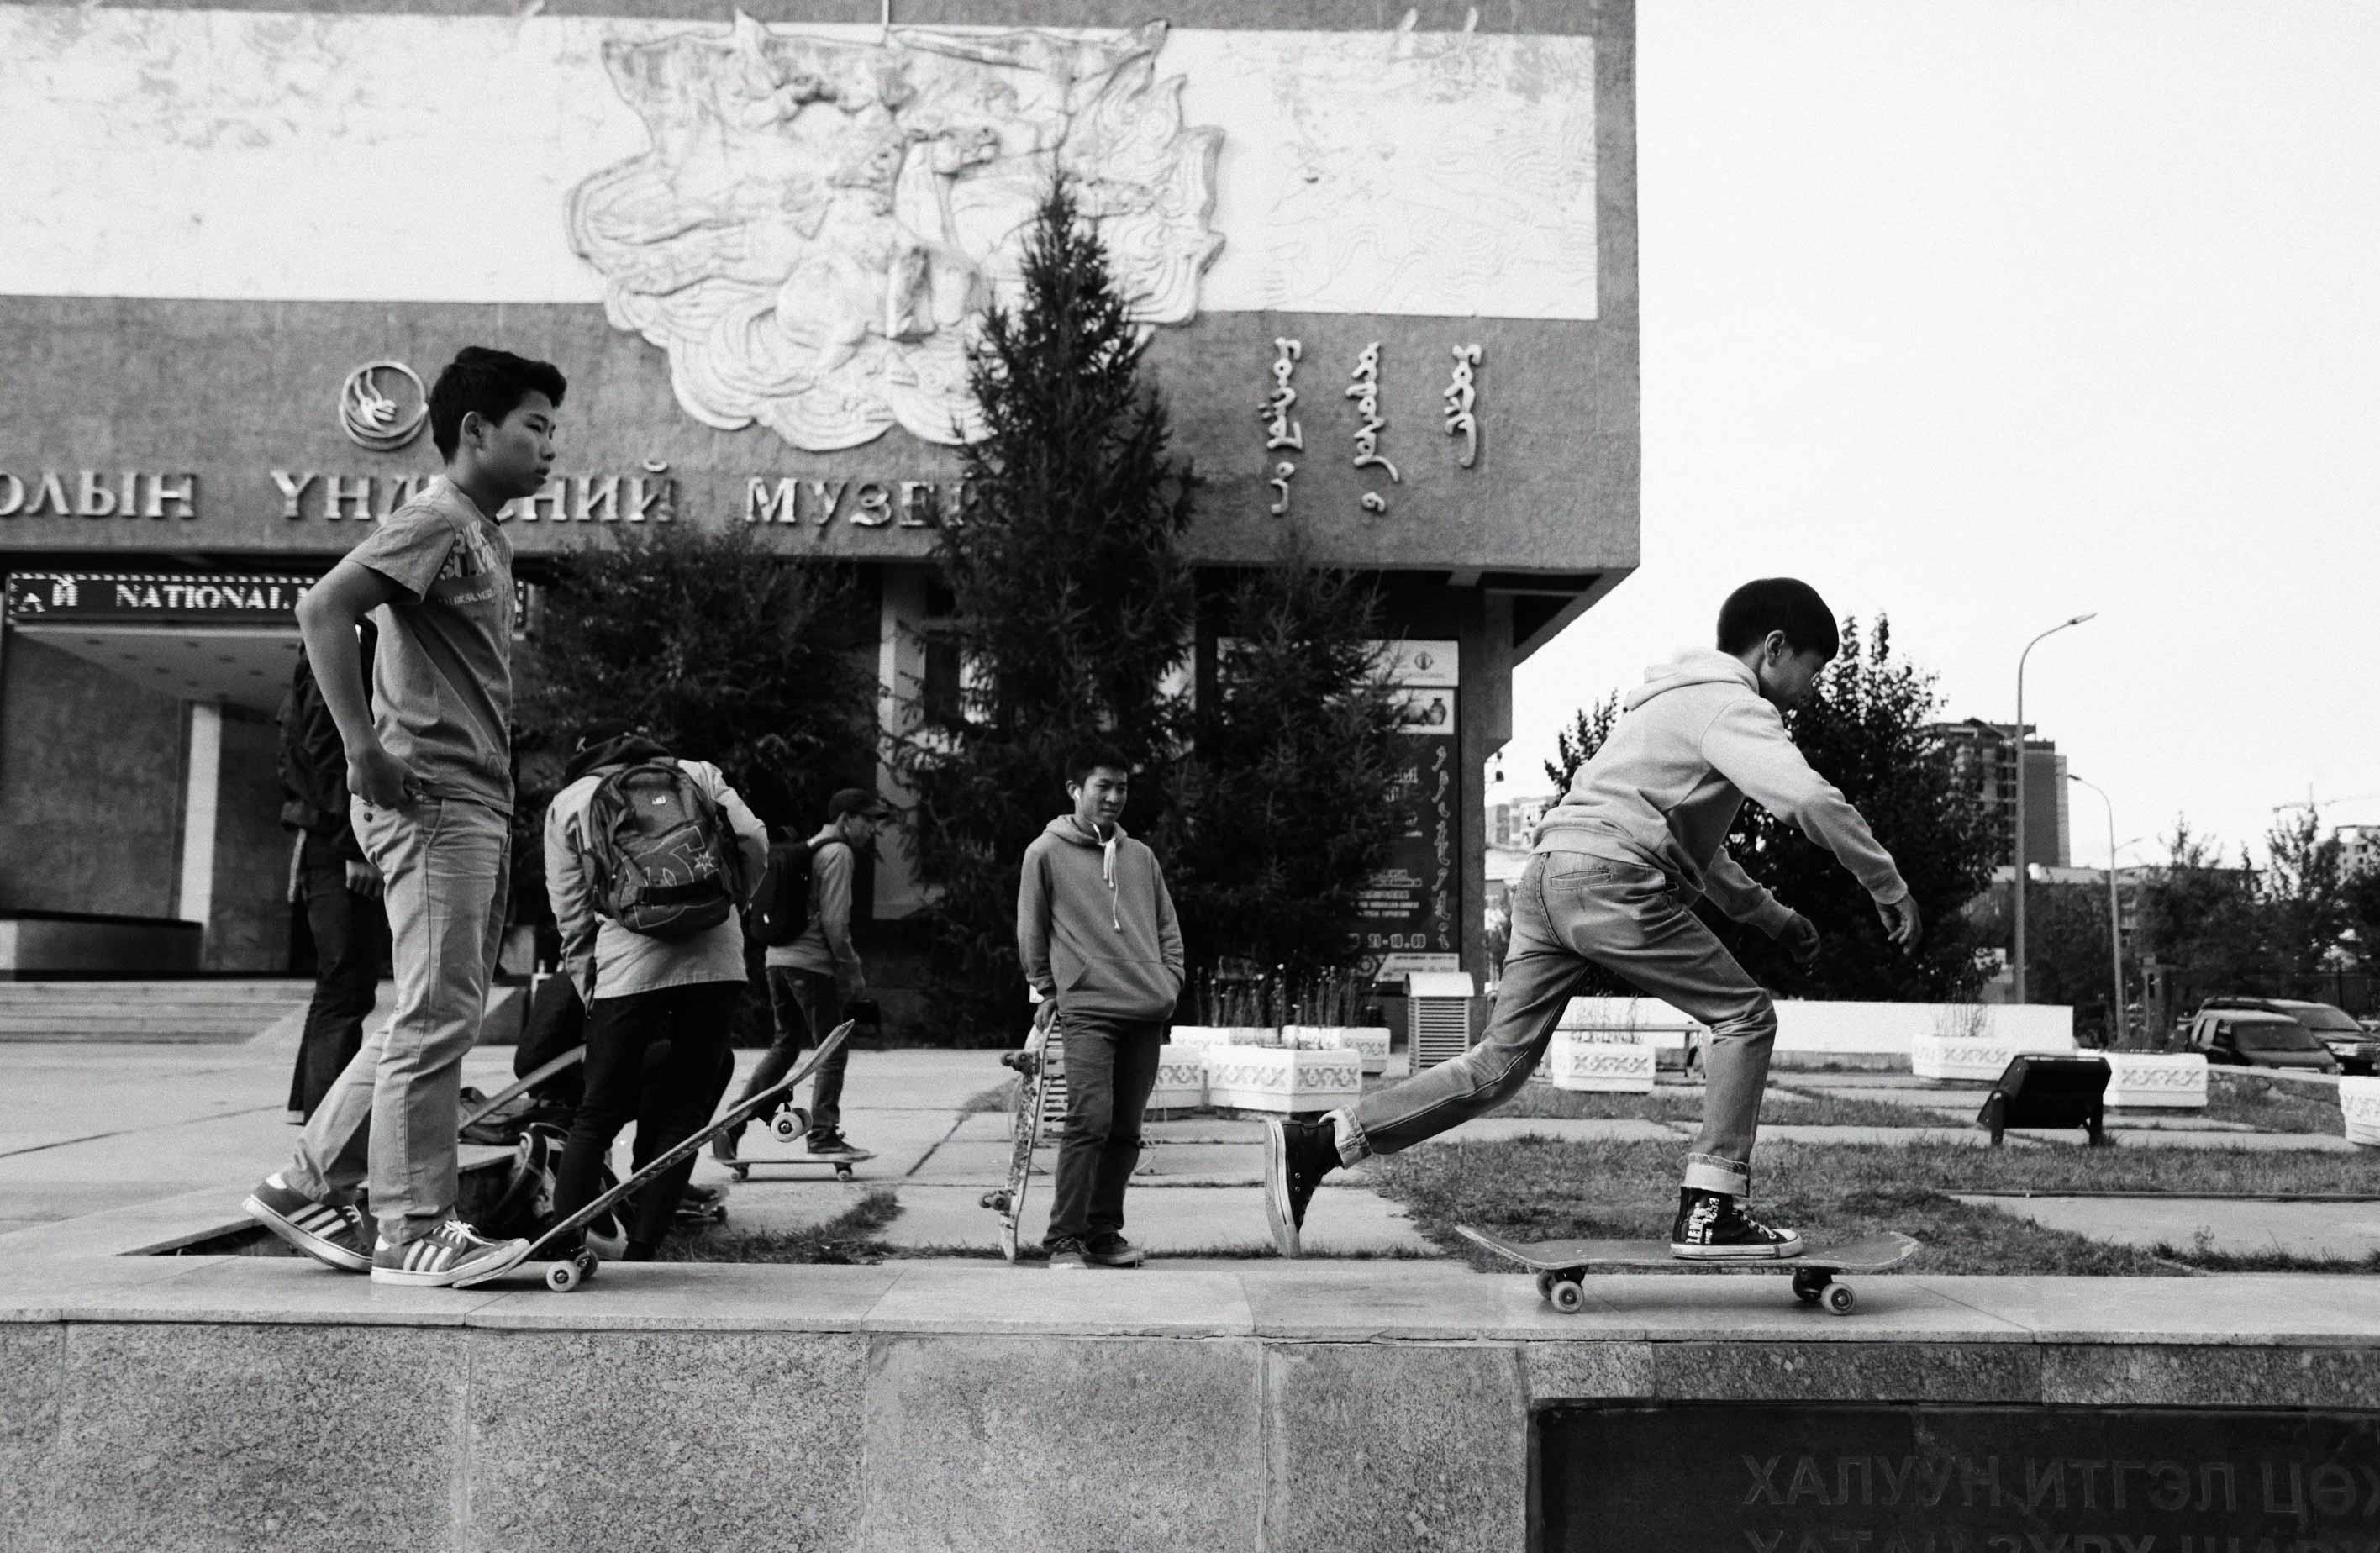 Mongolia Skate. Photo by Bejan Siavoshy.